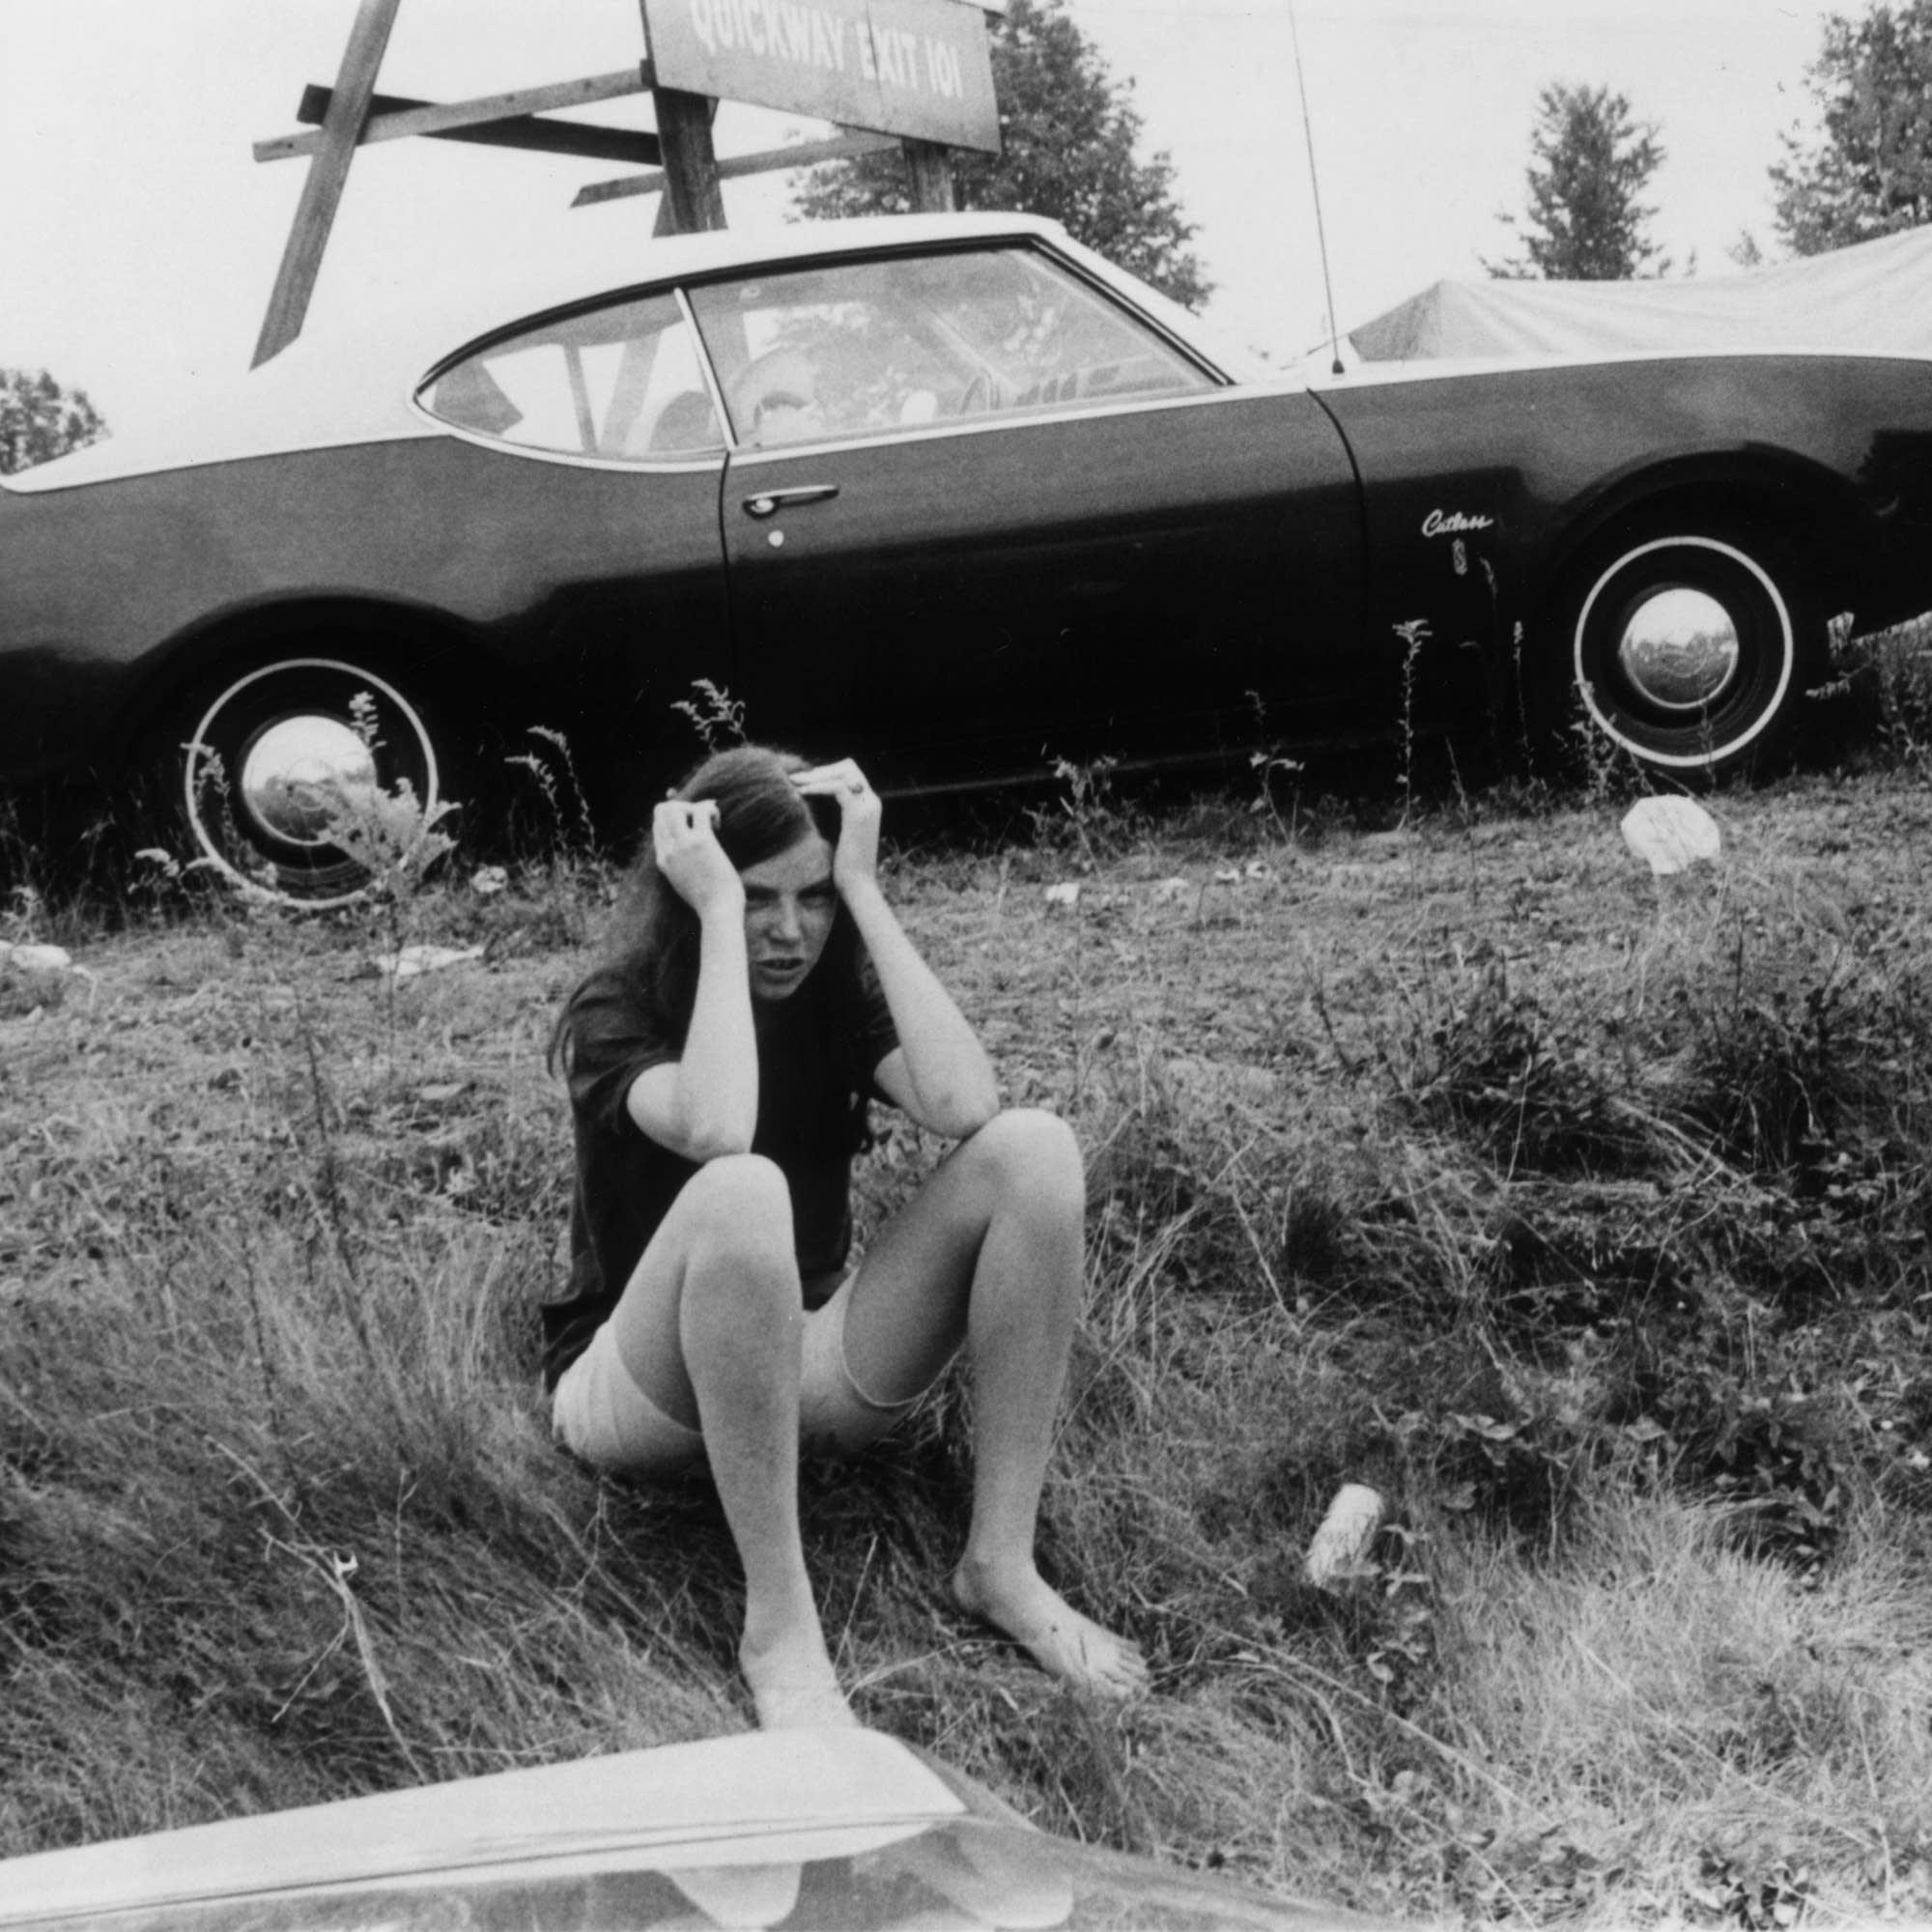 A festivalgoer at the original Woodstock in 1969.